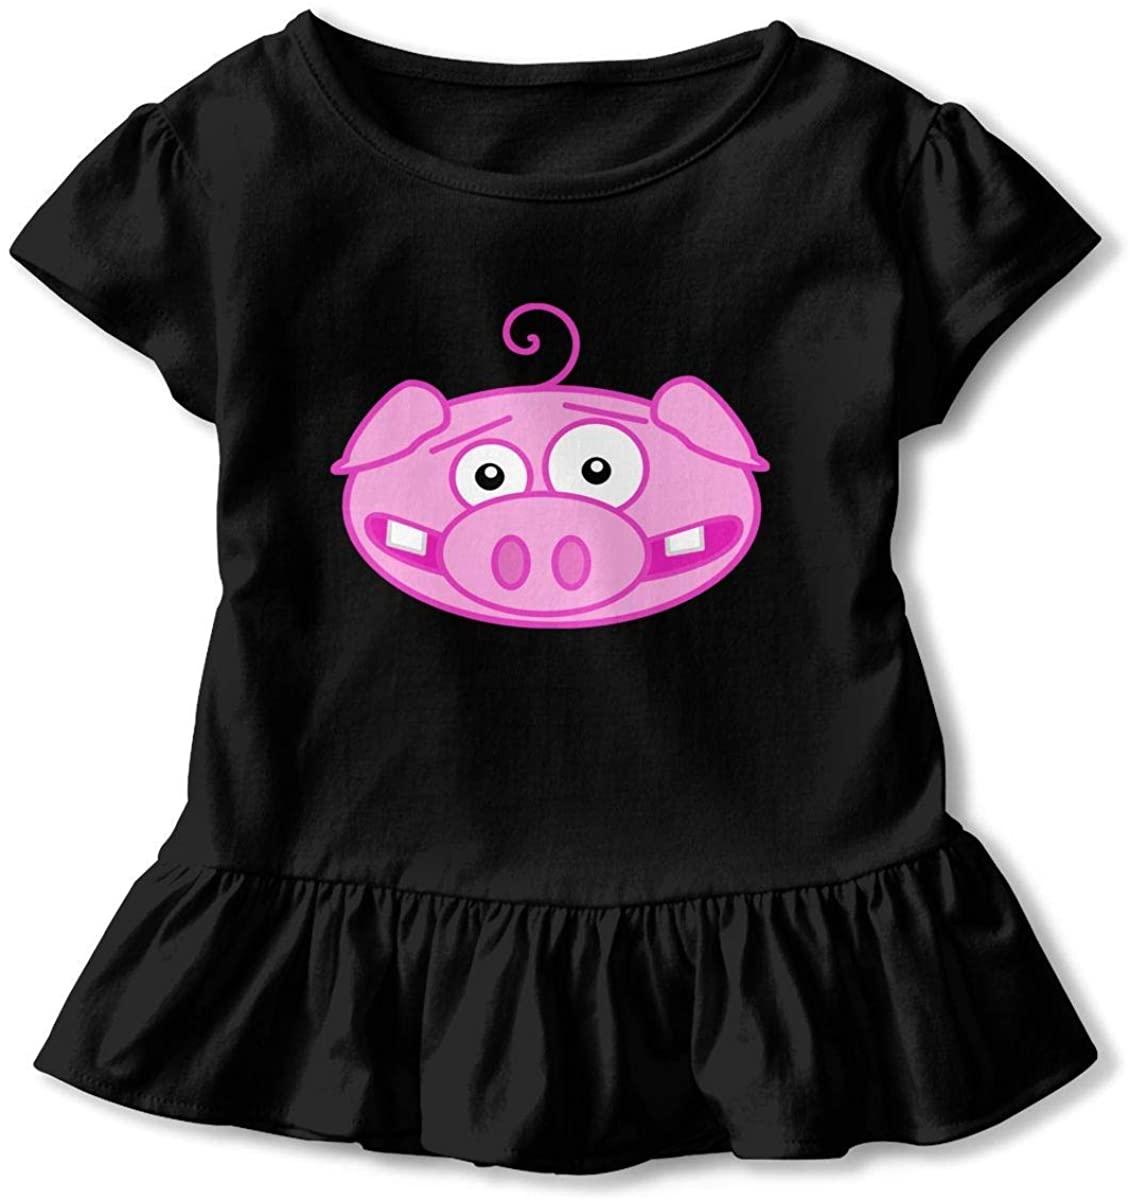 Funny-Pig-face 3D Tee Baseball Ruffle Short Sleeve Cotton T Shirts Top for Girls Kids Printed Dress